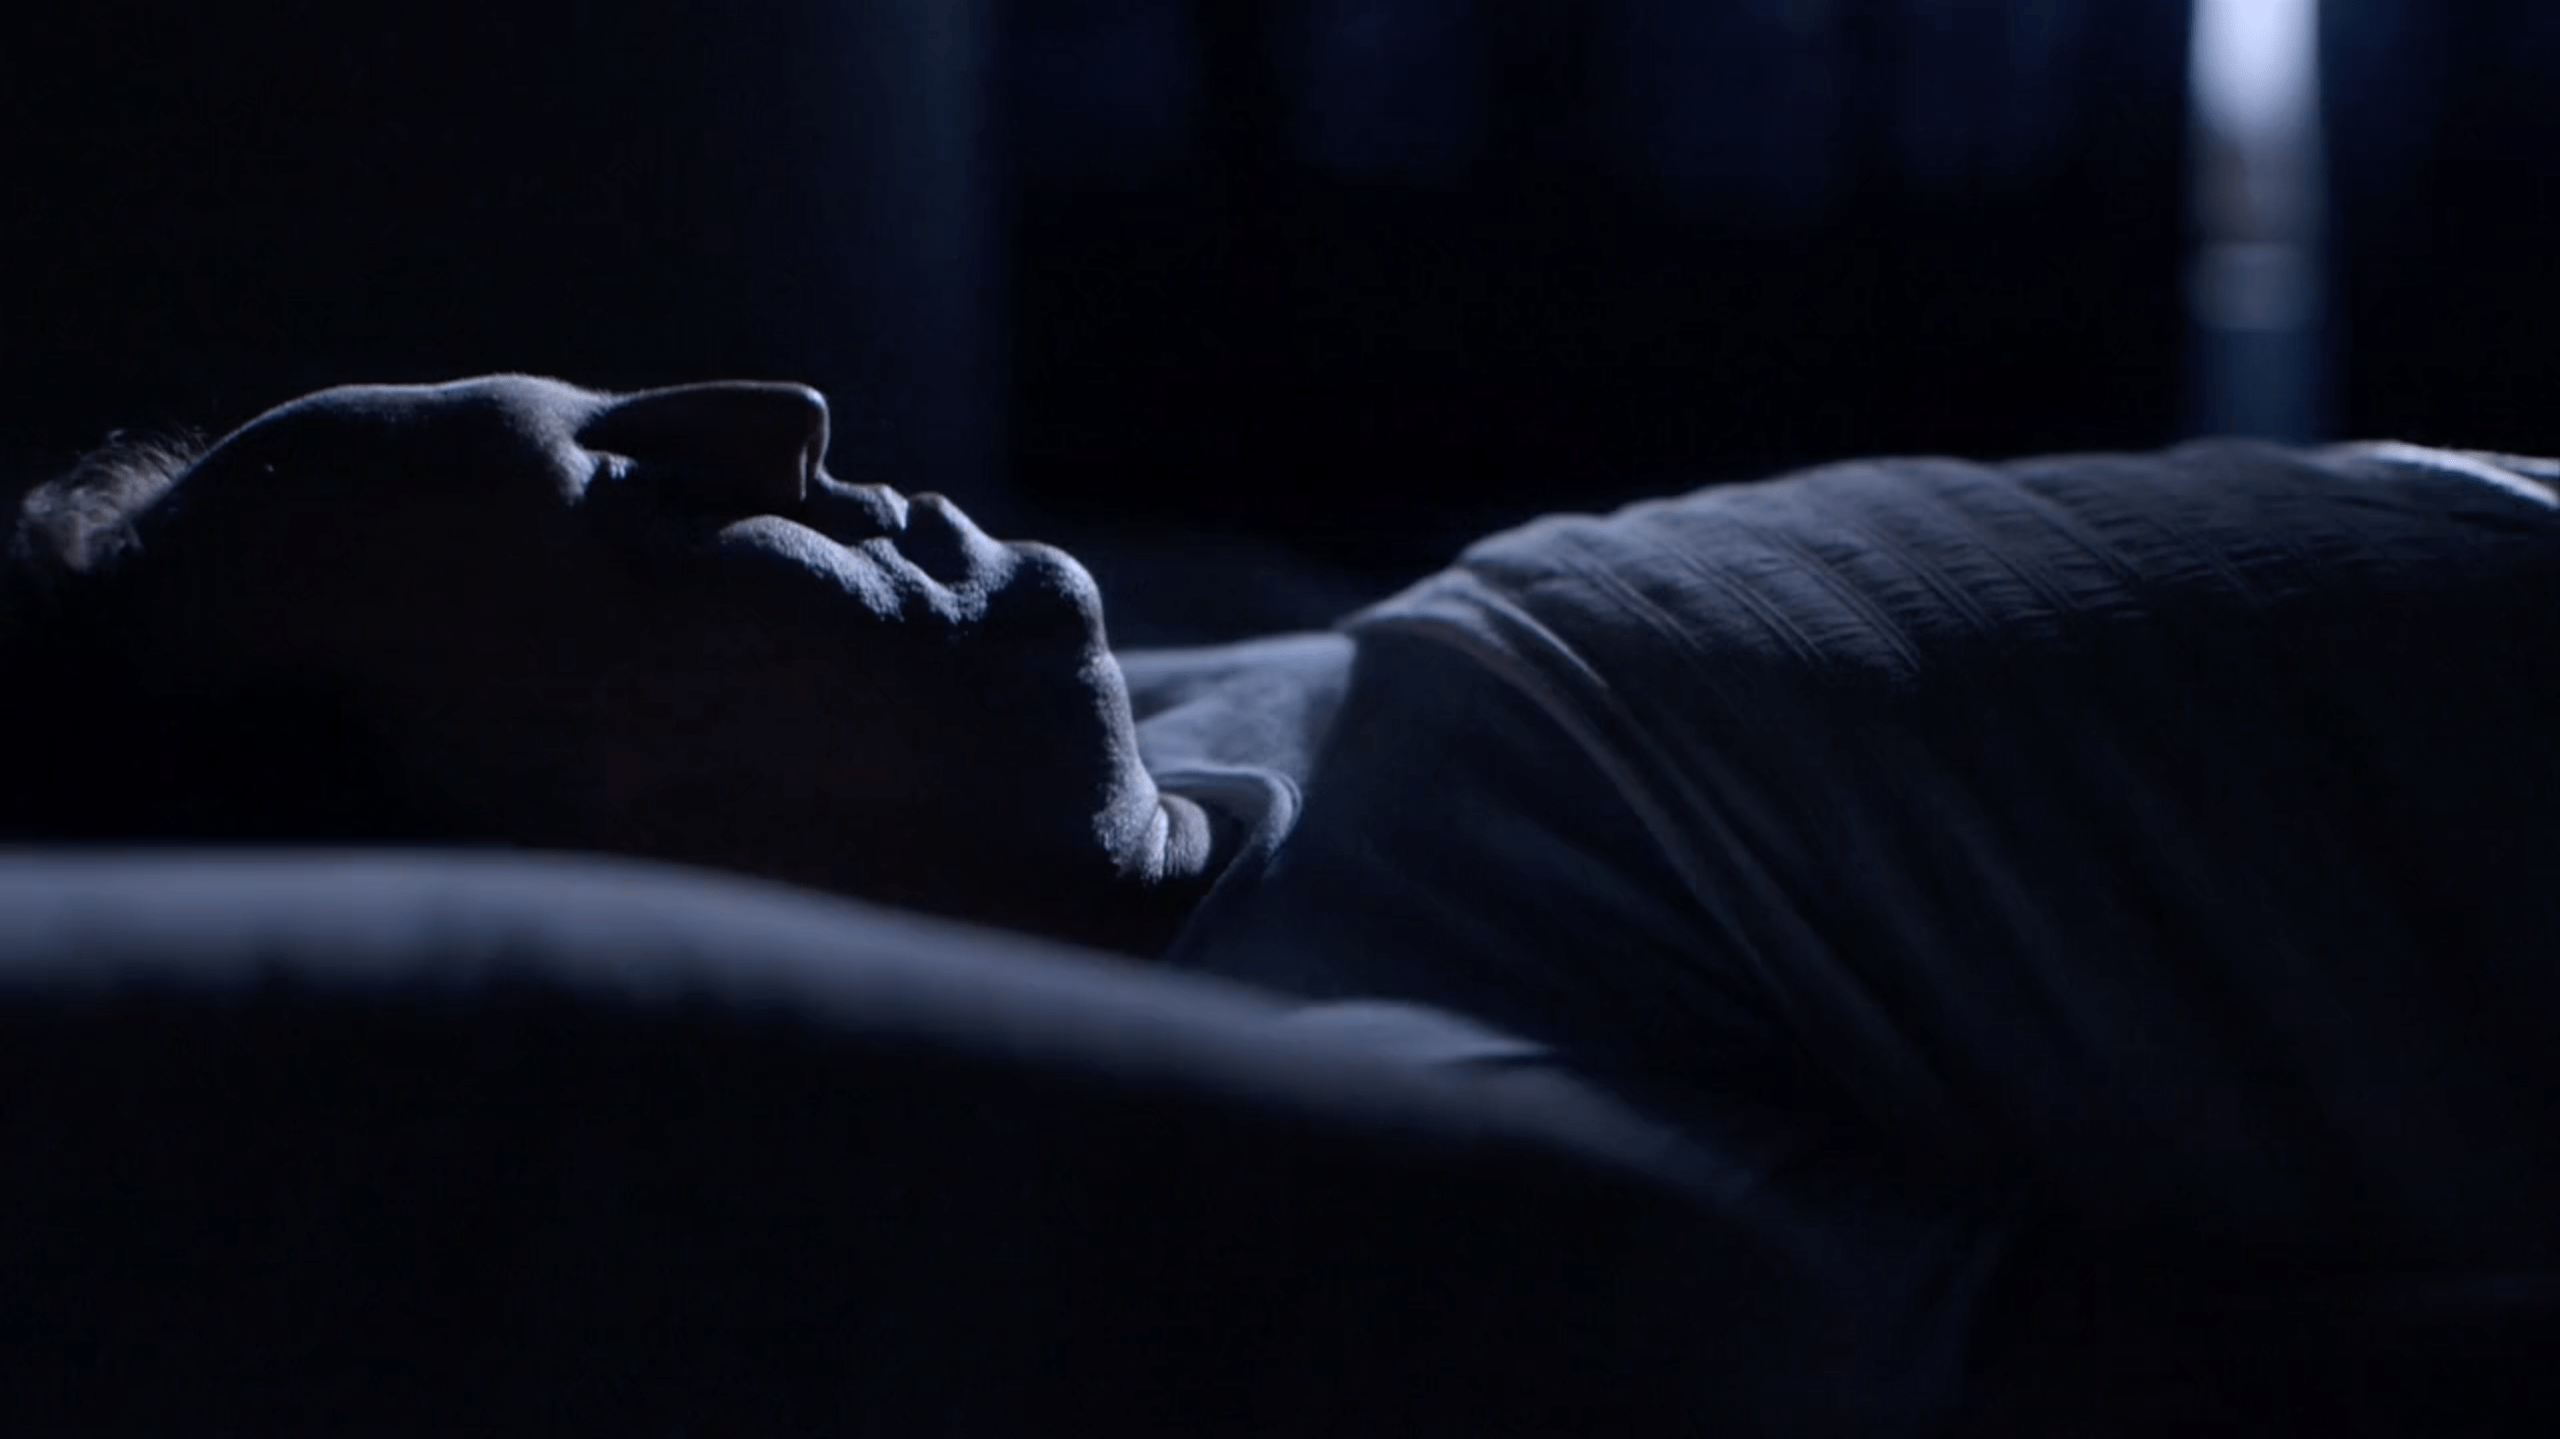 The 2019 Men's Health Sleep Awards